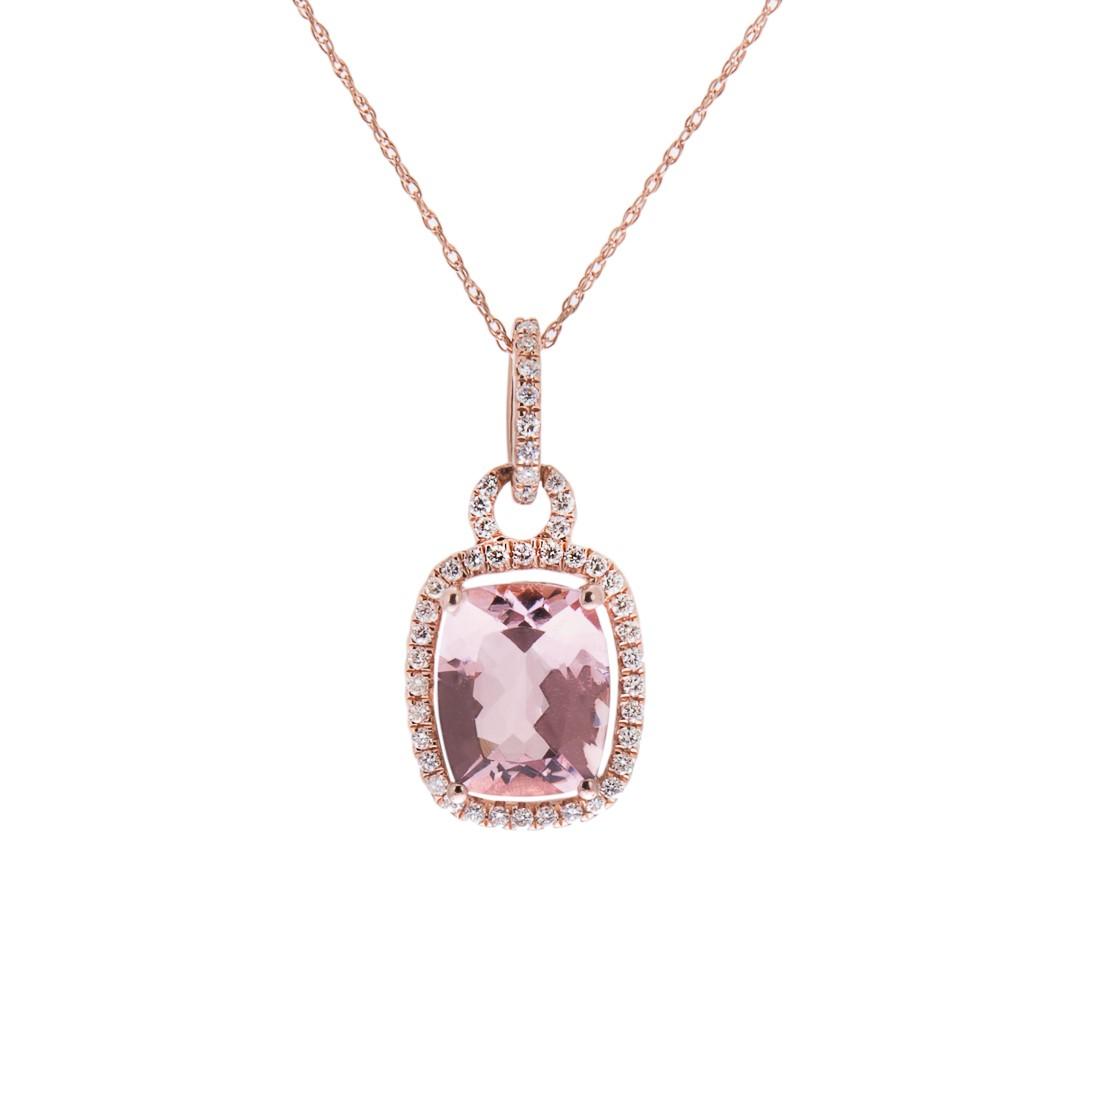 H1200 1rose gold morganite and diamond pendant   Copy